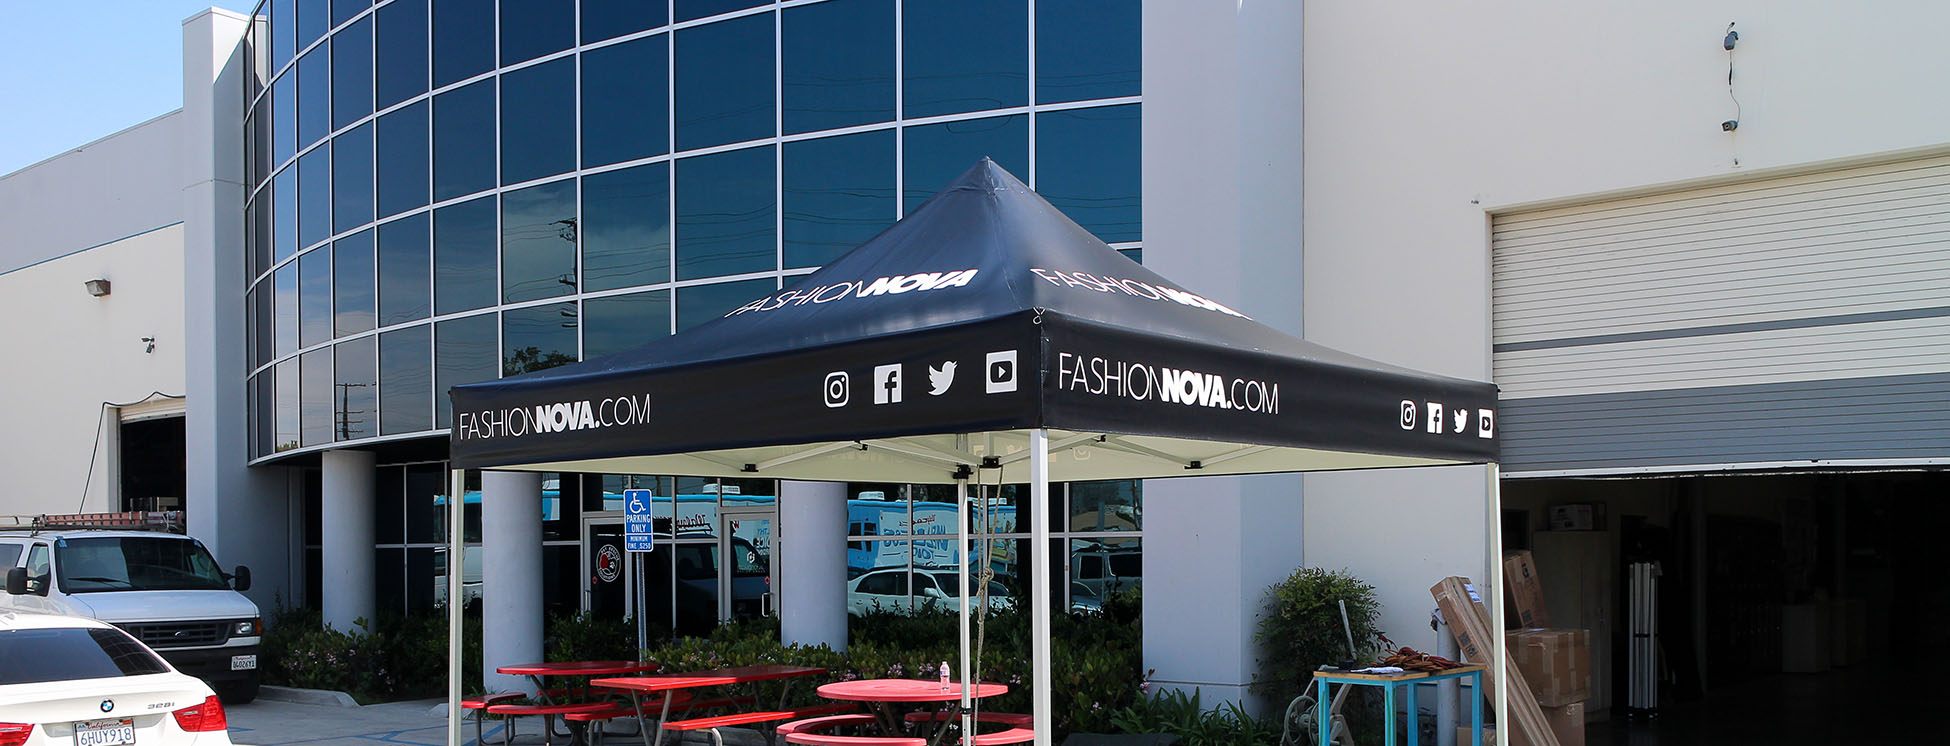 Fashion-Nova-header.jpg